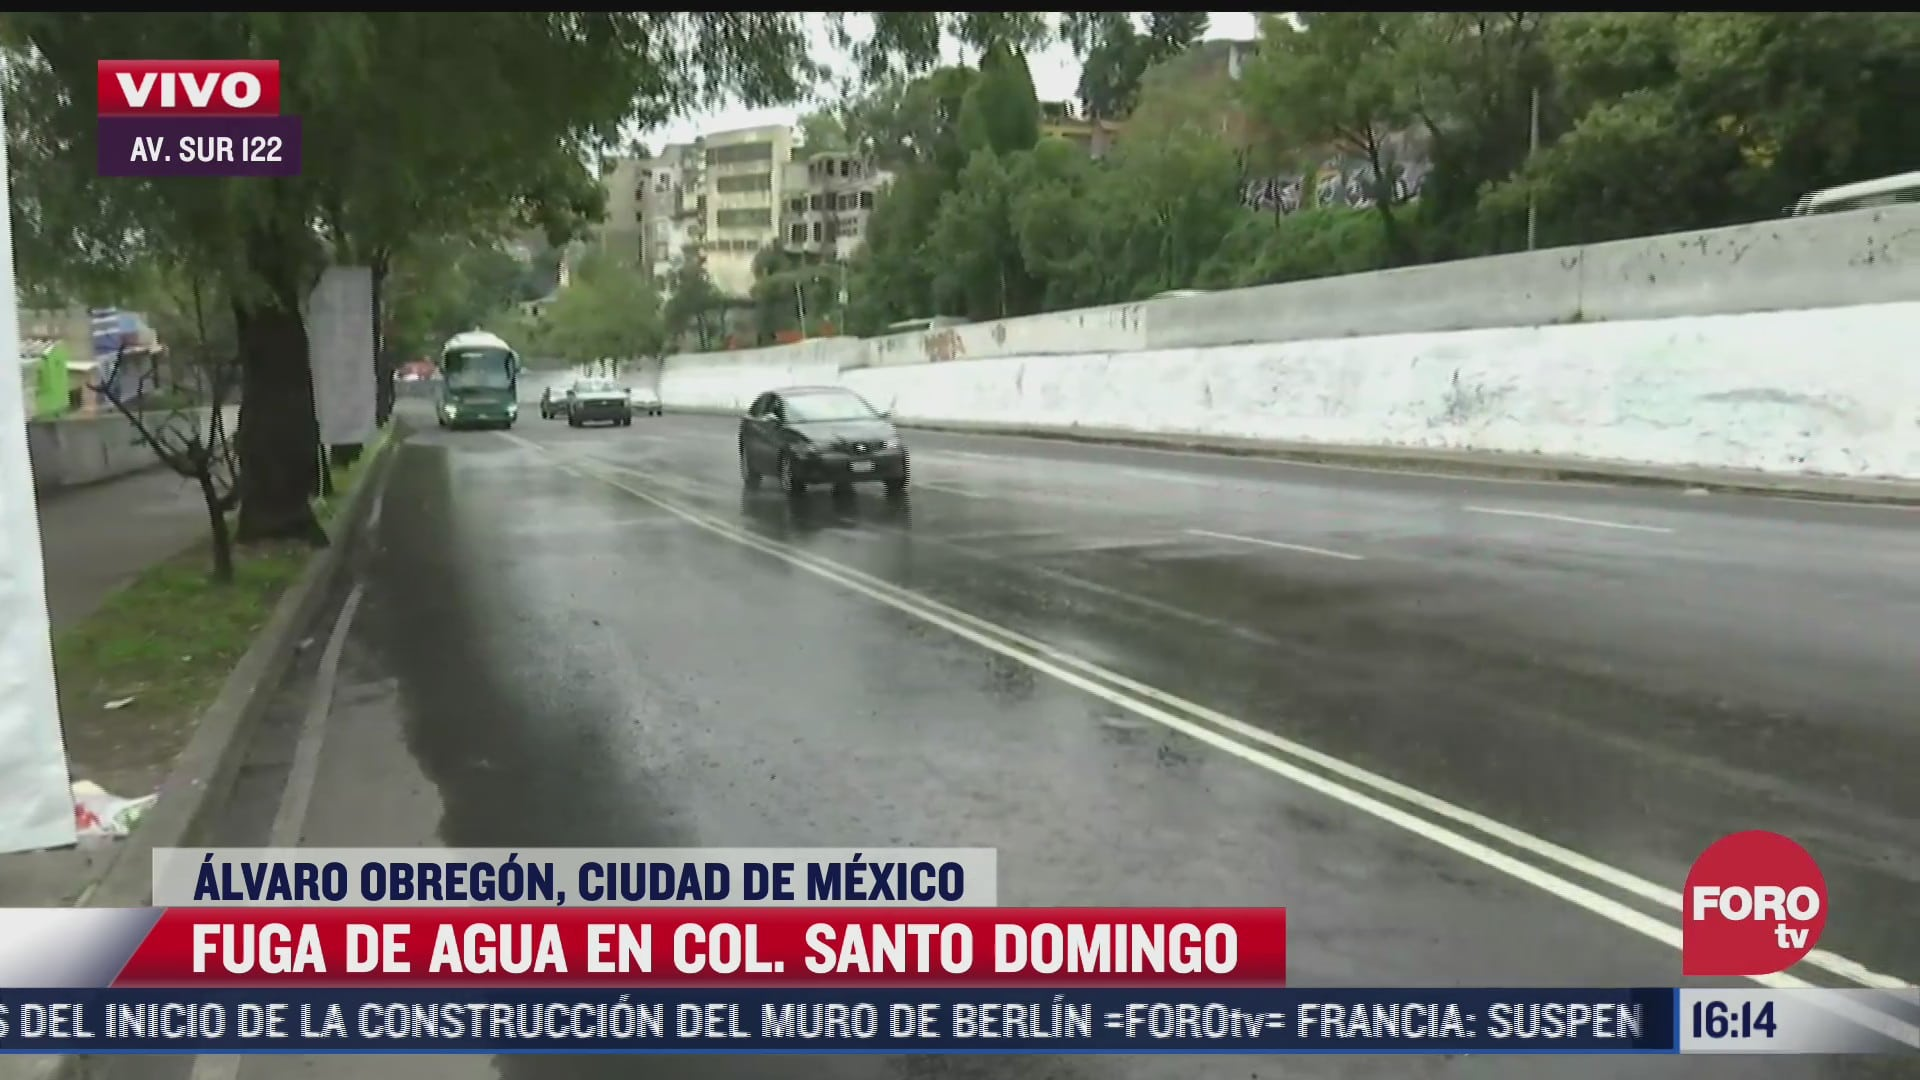 reportan fuga de agua en la colonia santo domingo alvaro obregon